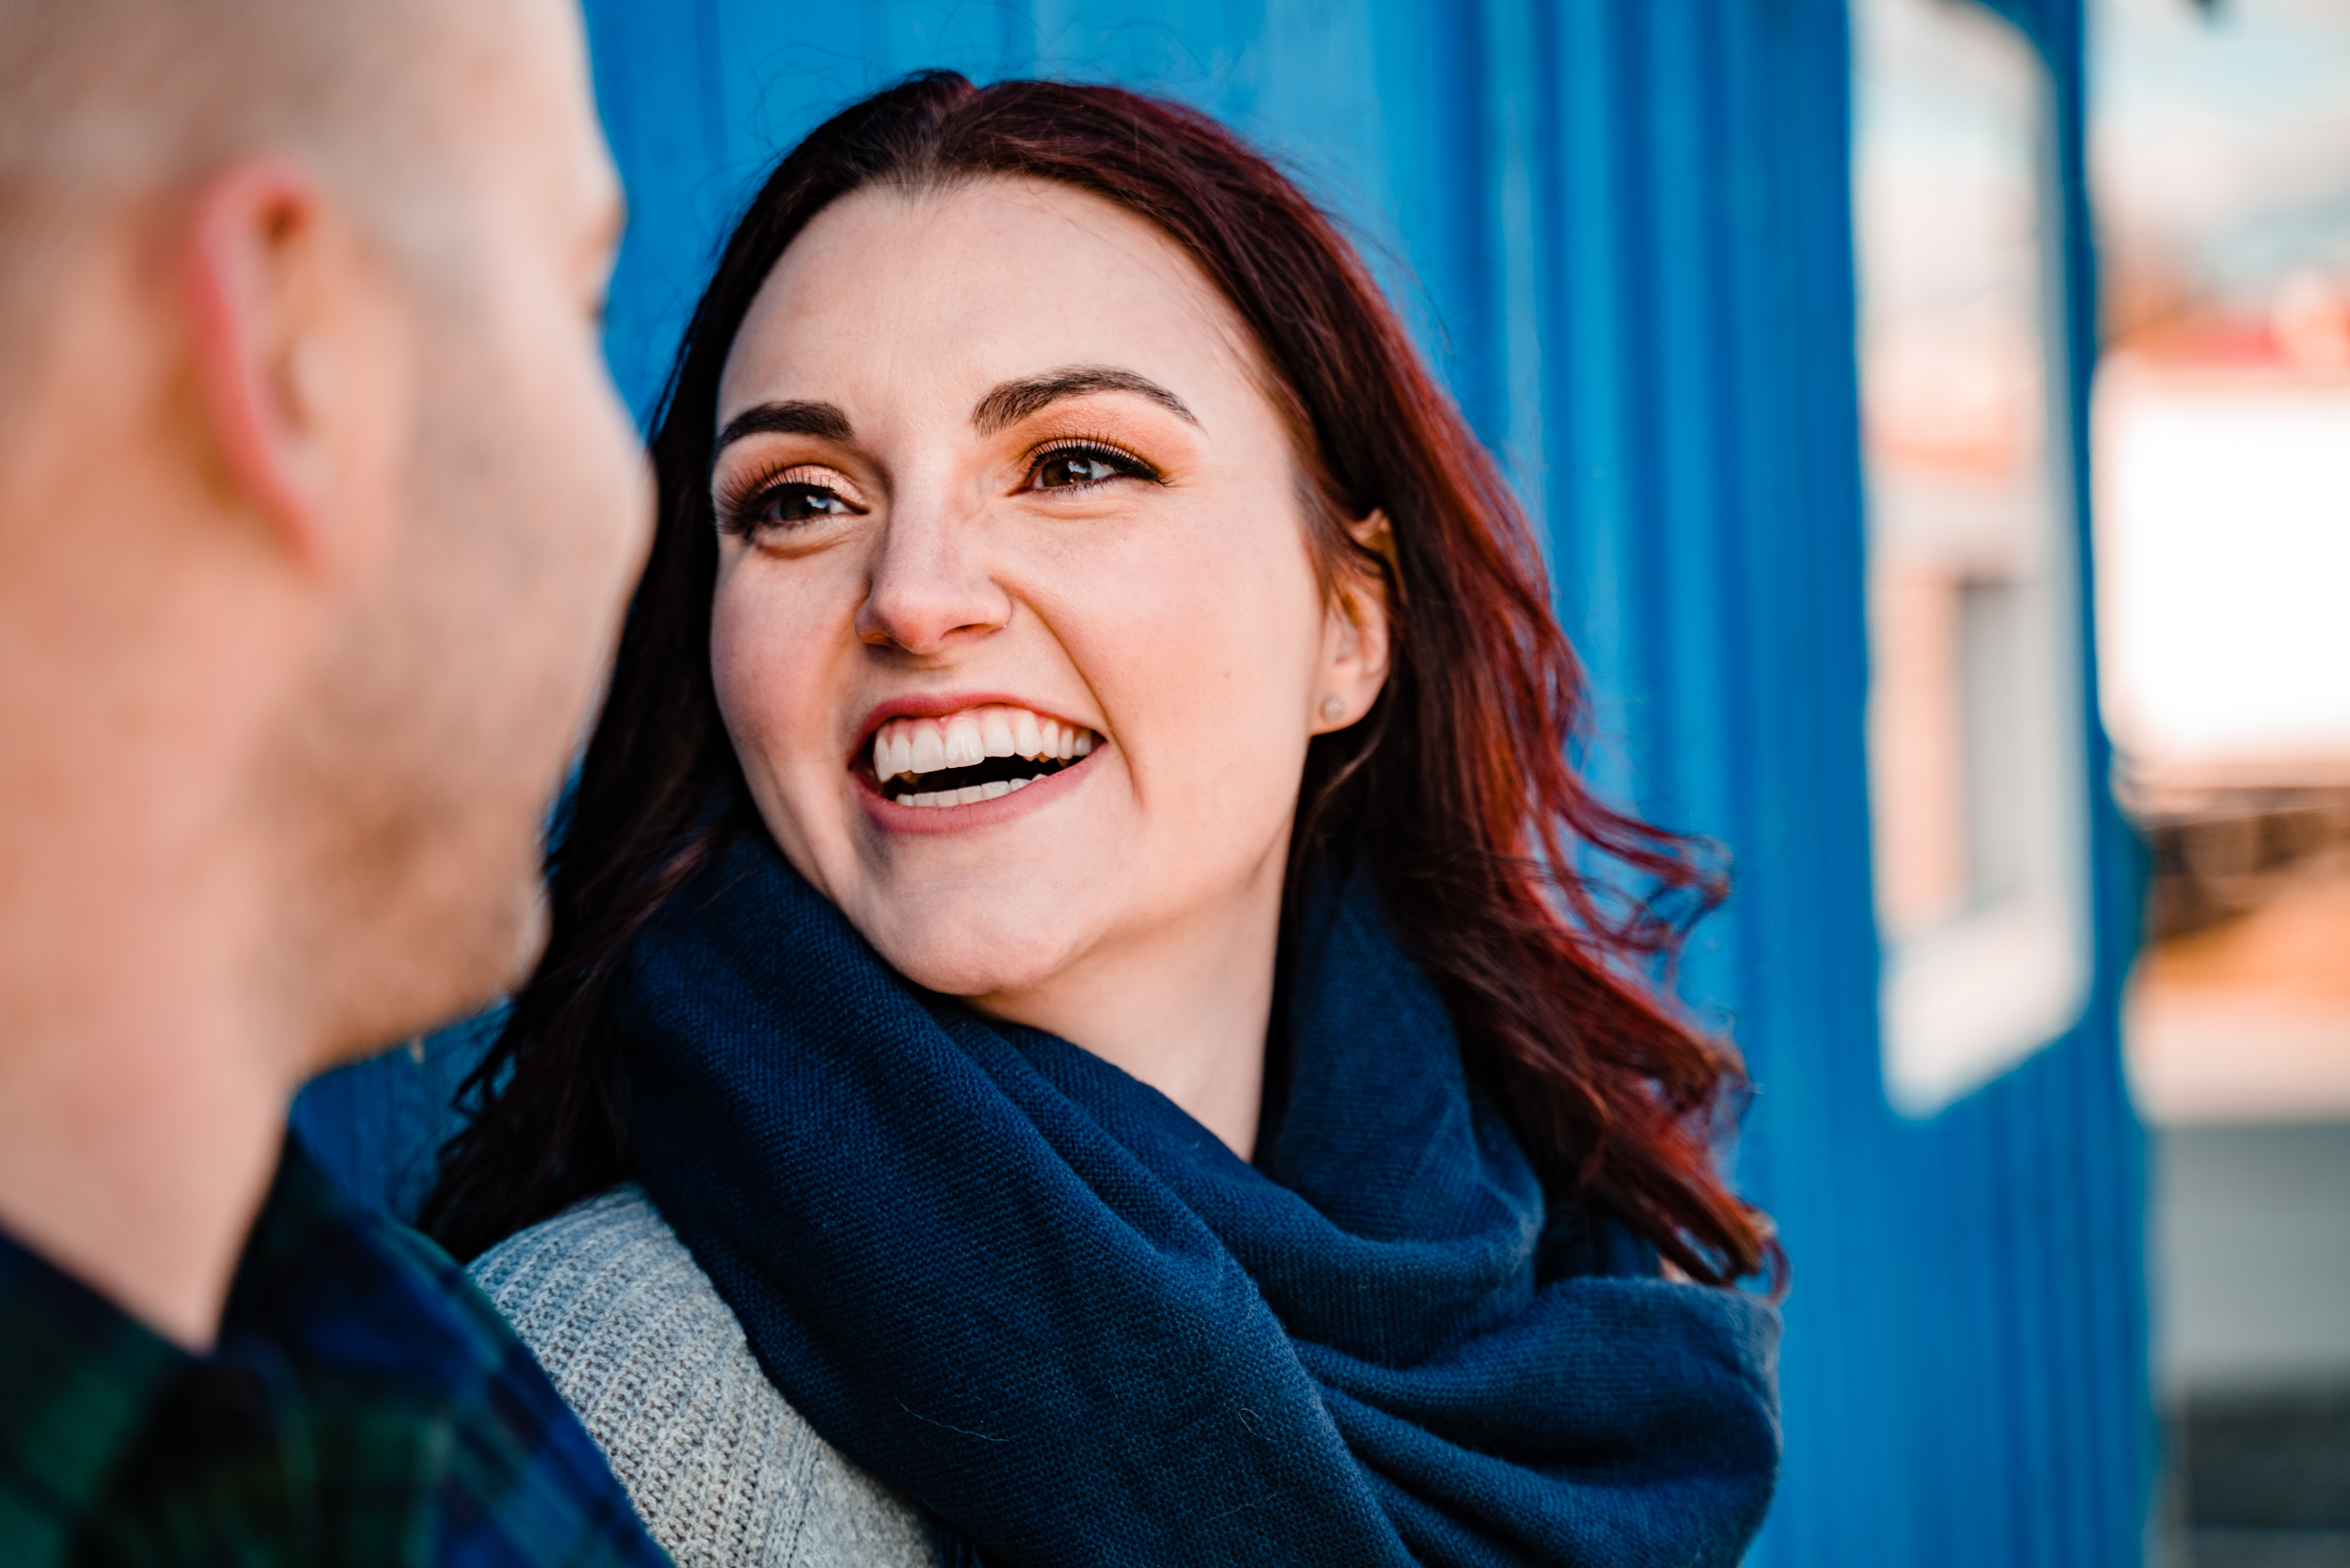 Sarah&Shayne-Halifax-engagement-weddingphotography-weddingphotographers-novascotia (3 of 41).jpg